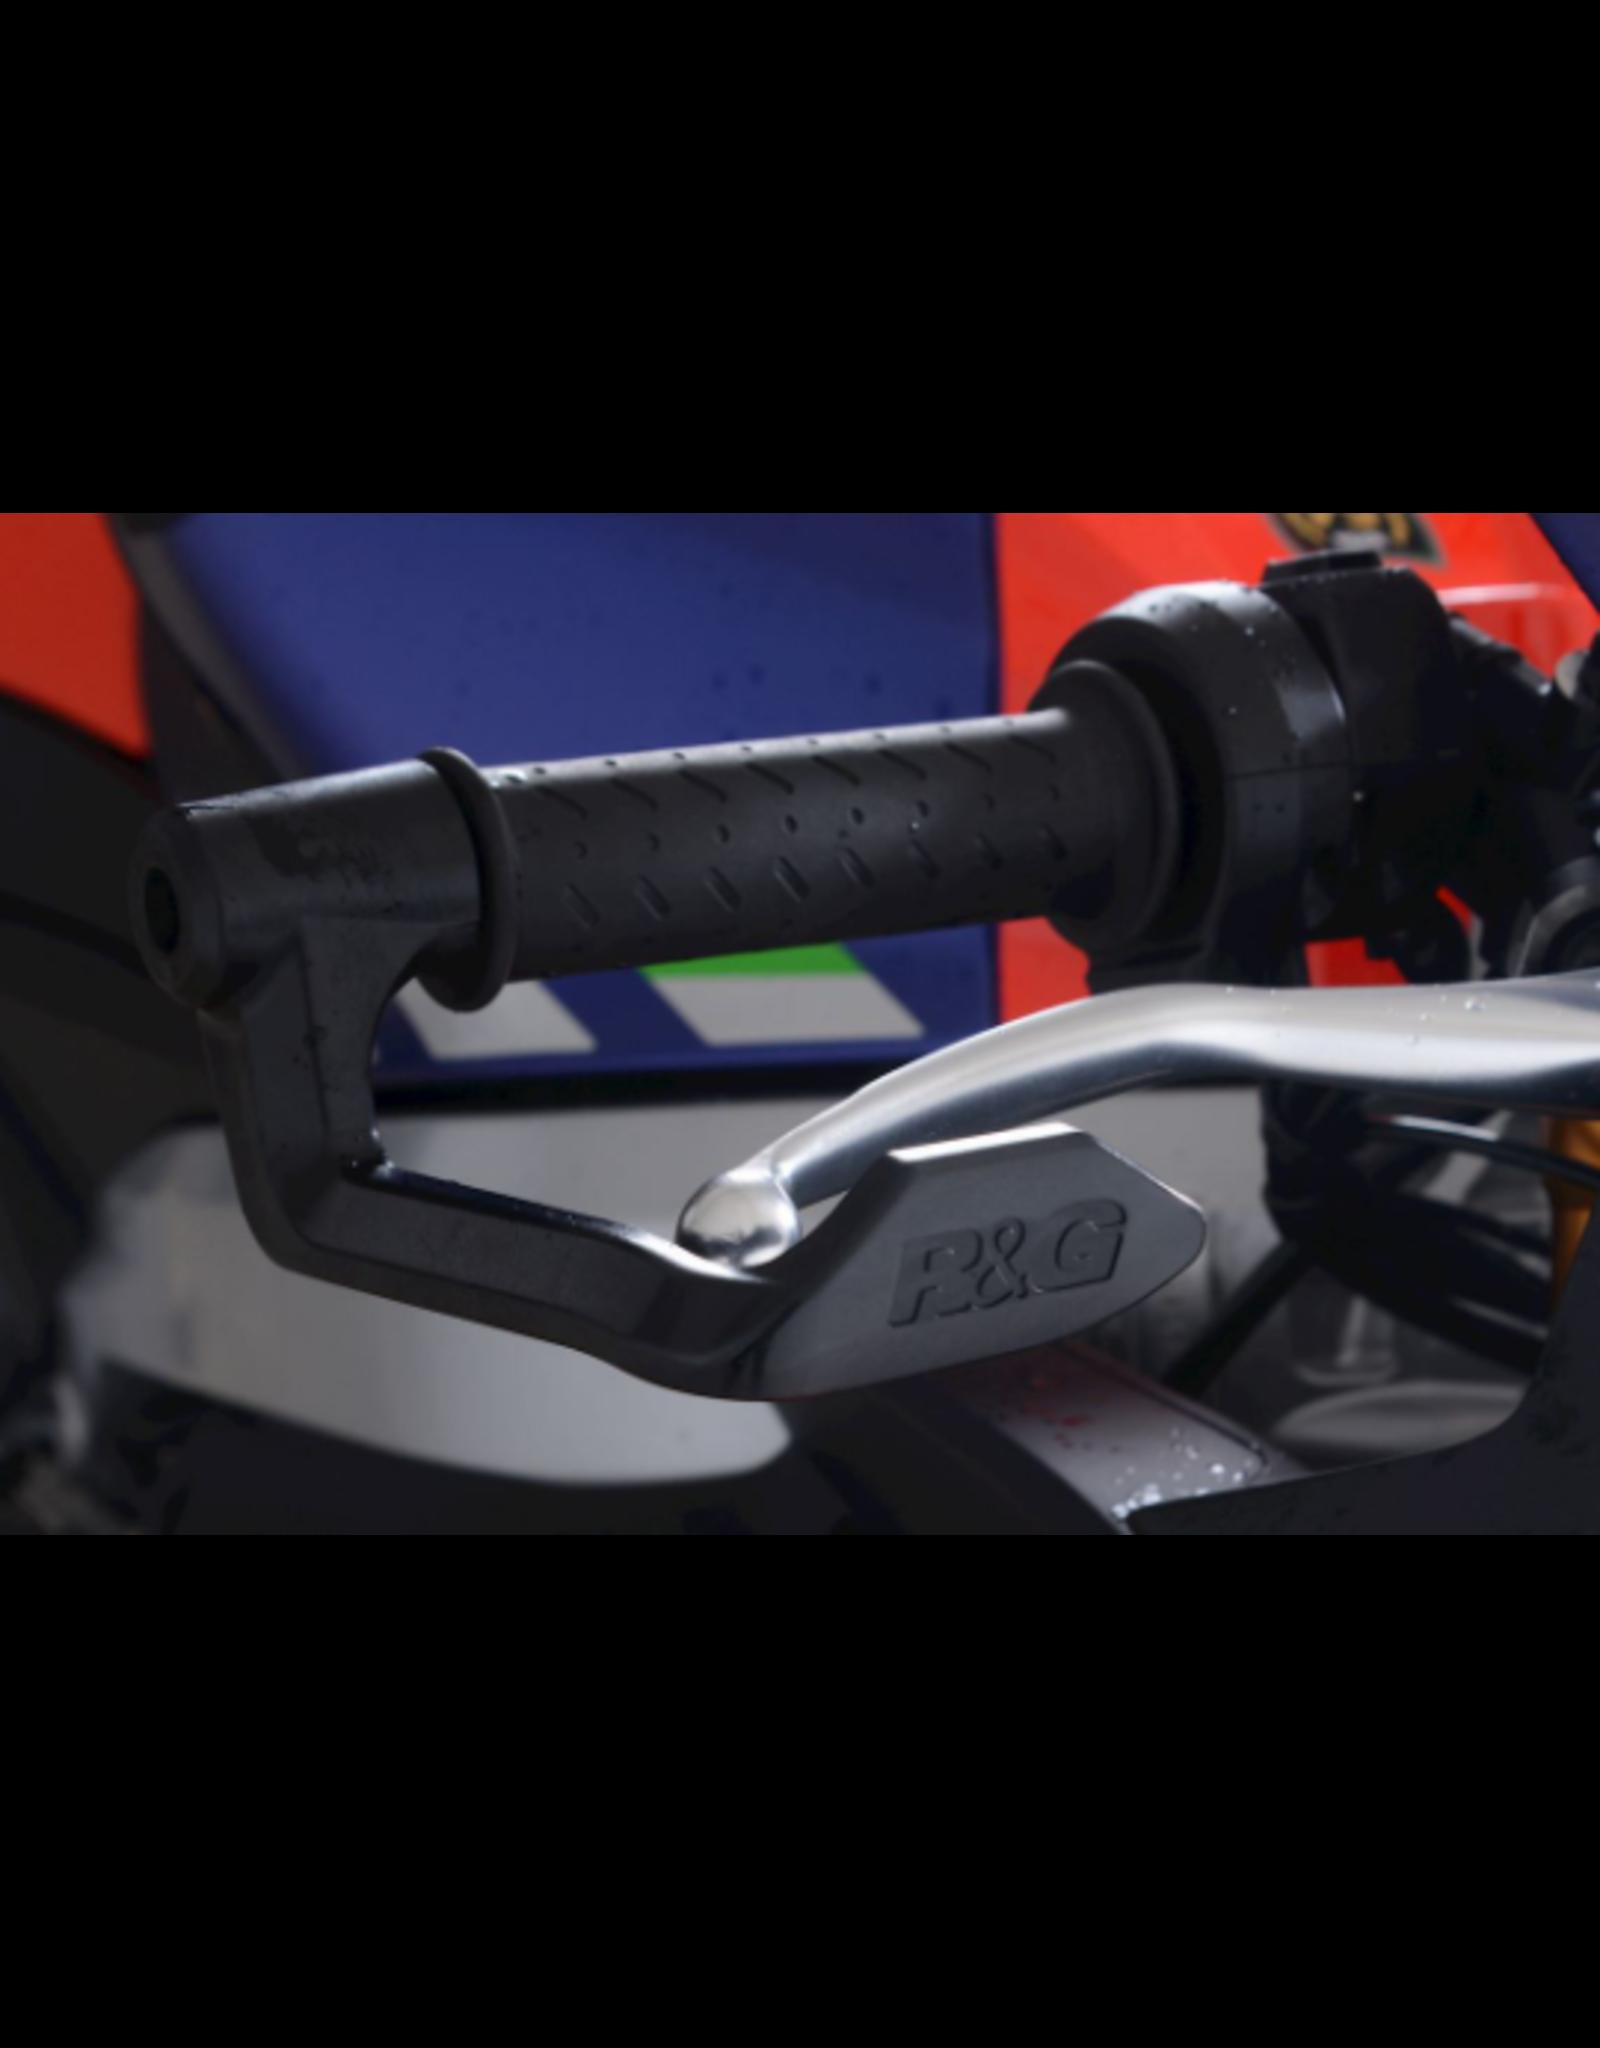 R&G RS 660 Brake Lever Guard BLG0030BK